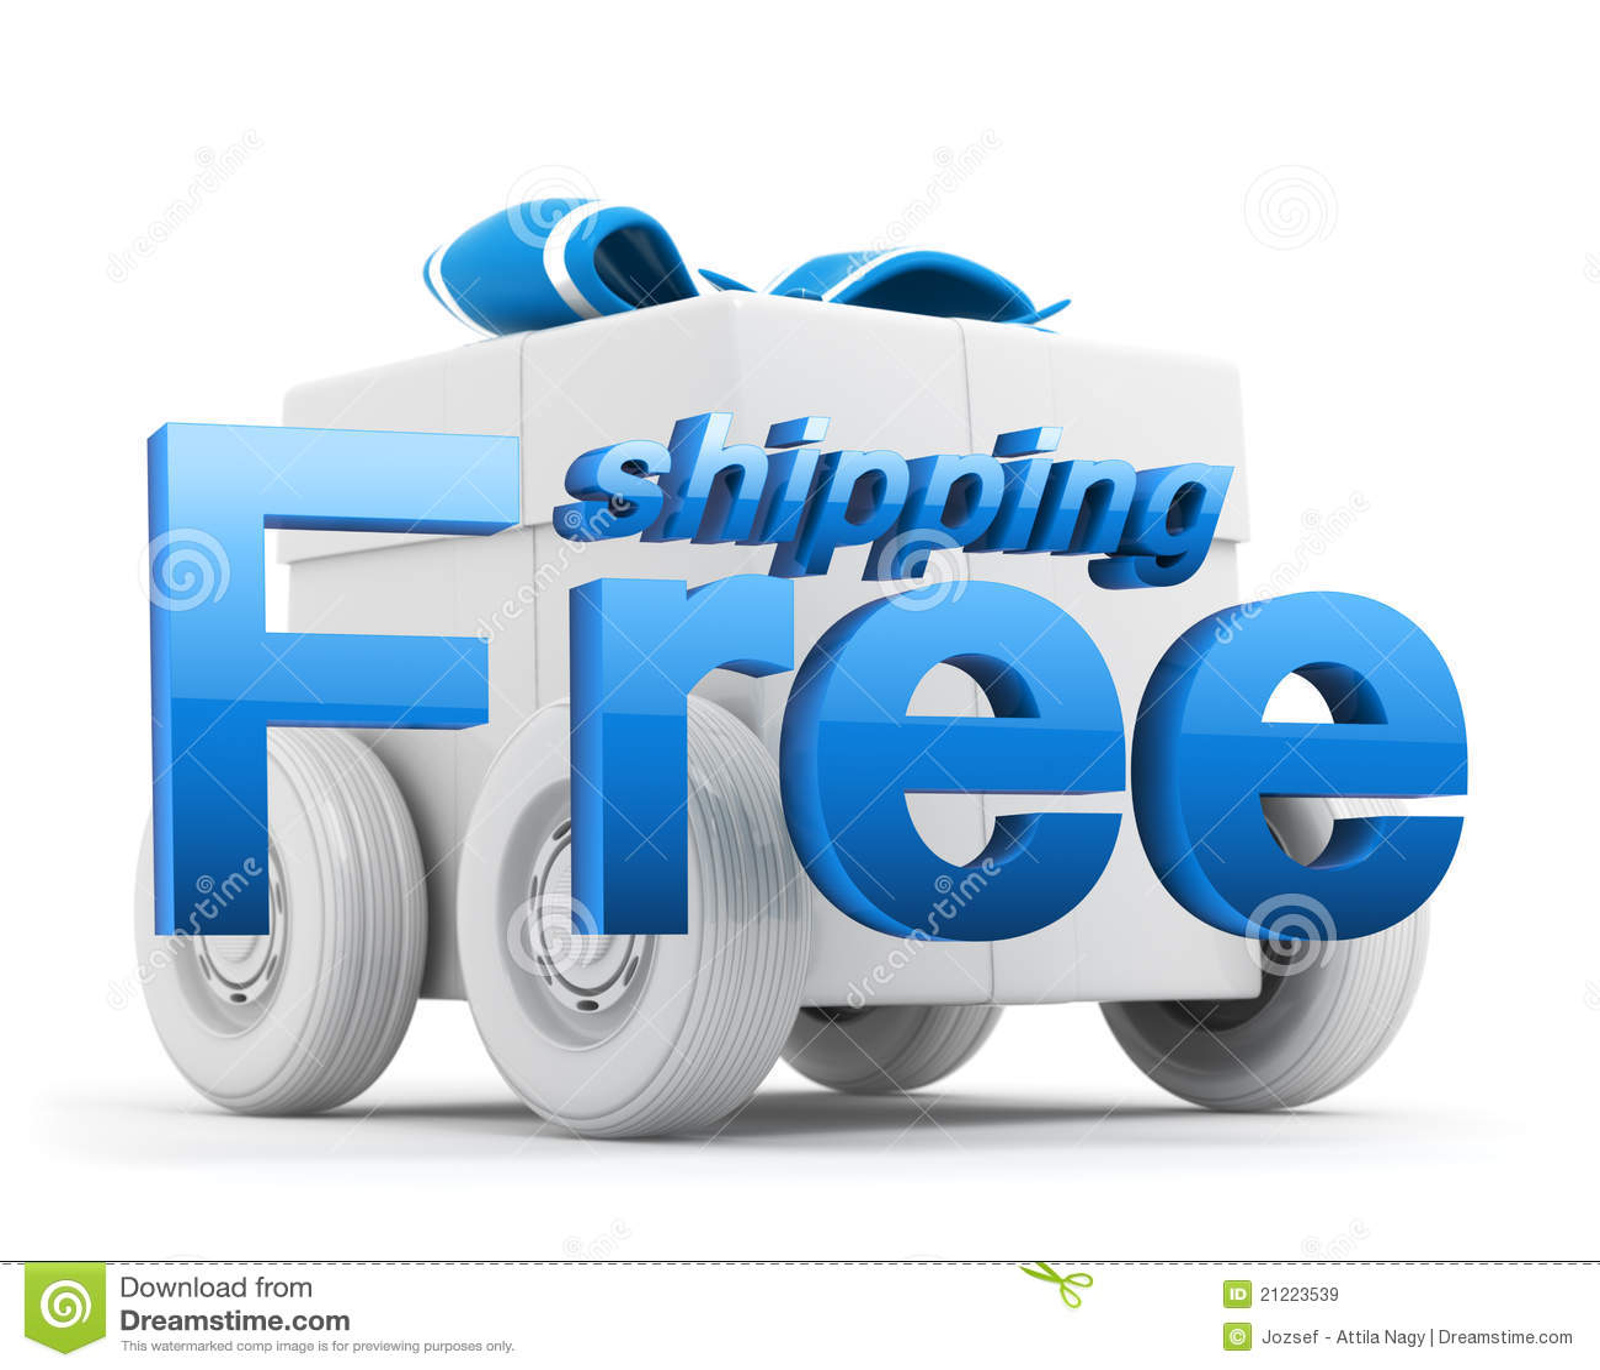 Free shipping icon gift box blue stock illustration royalty free stock photo negle Choice Image